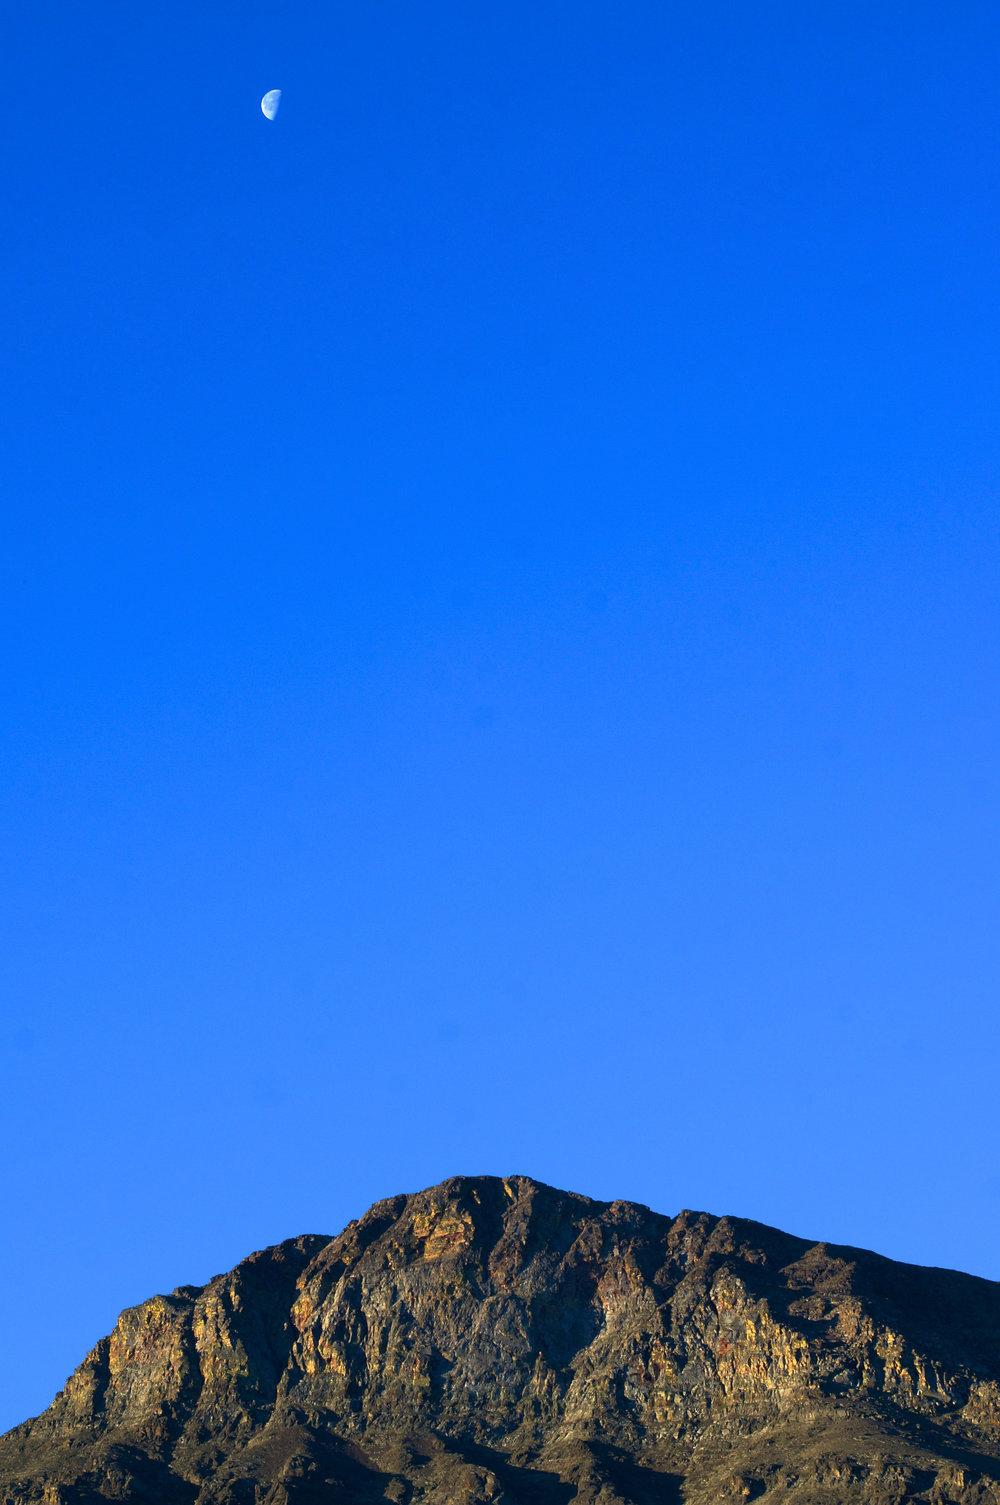 montana_glacier_national_park_st_marys_moon.jpg